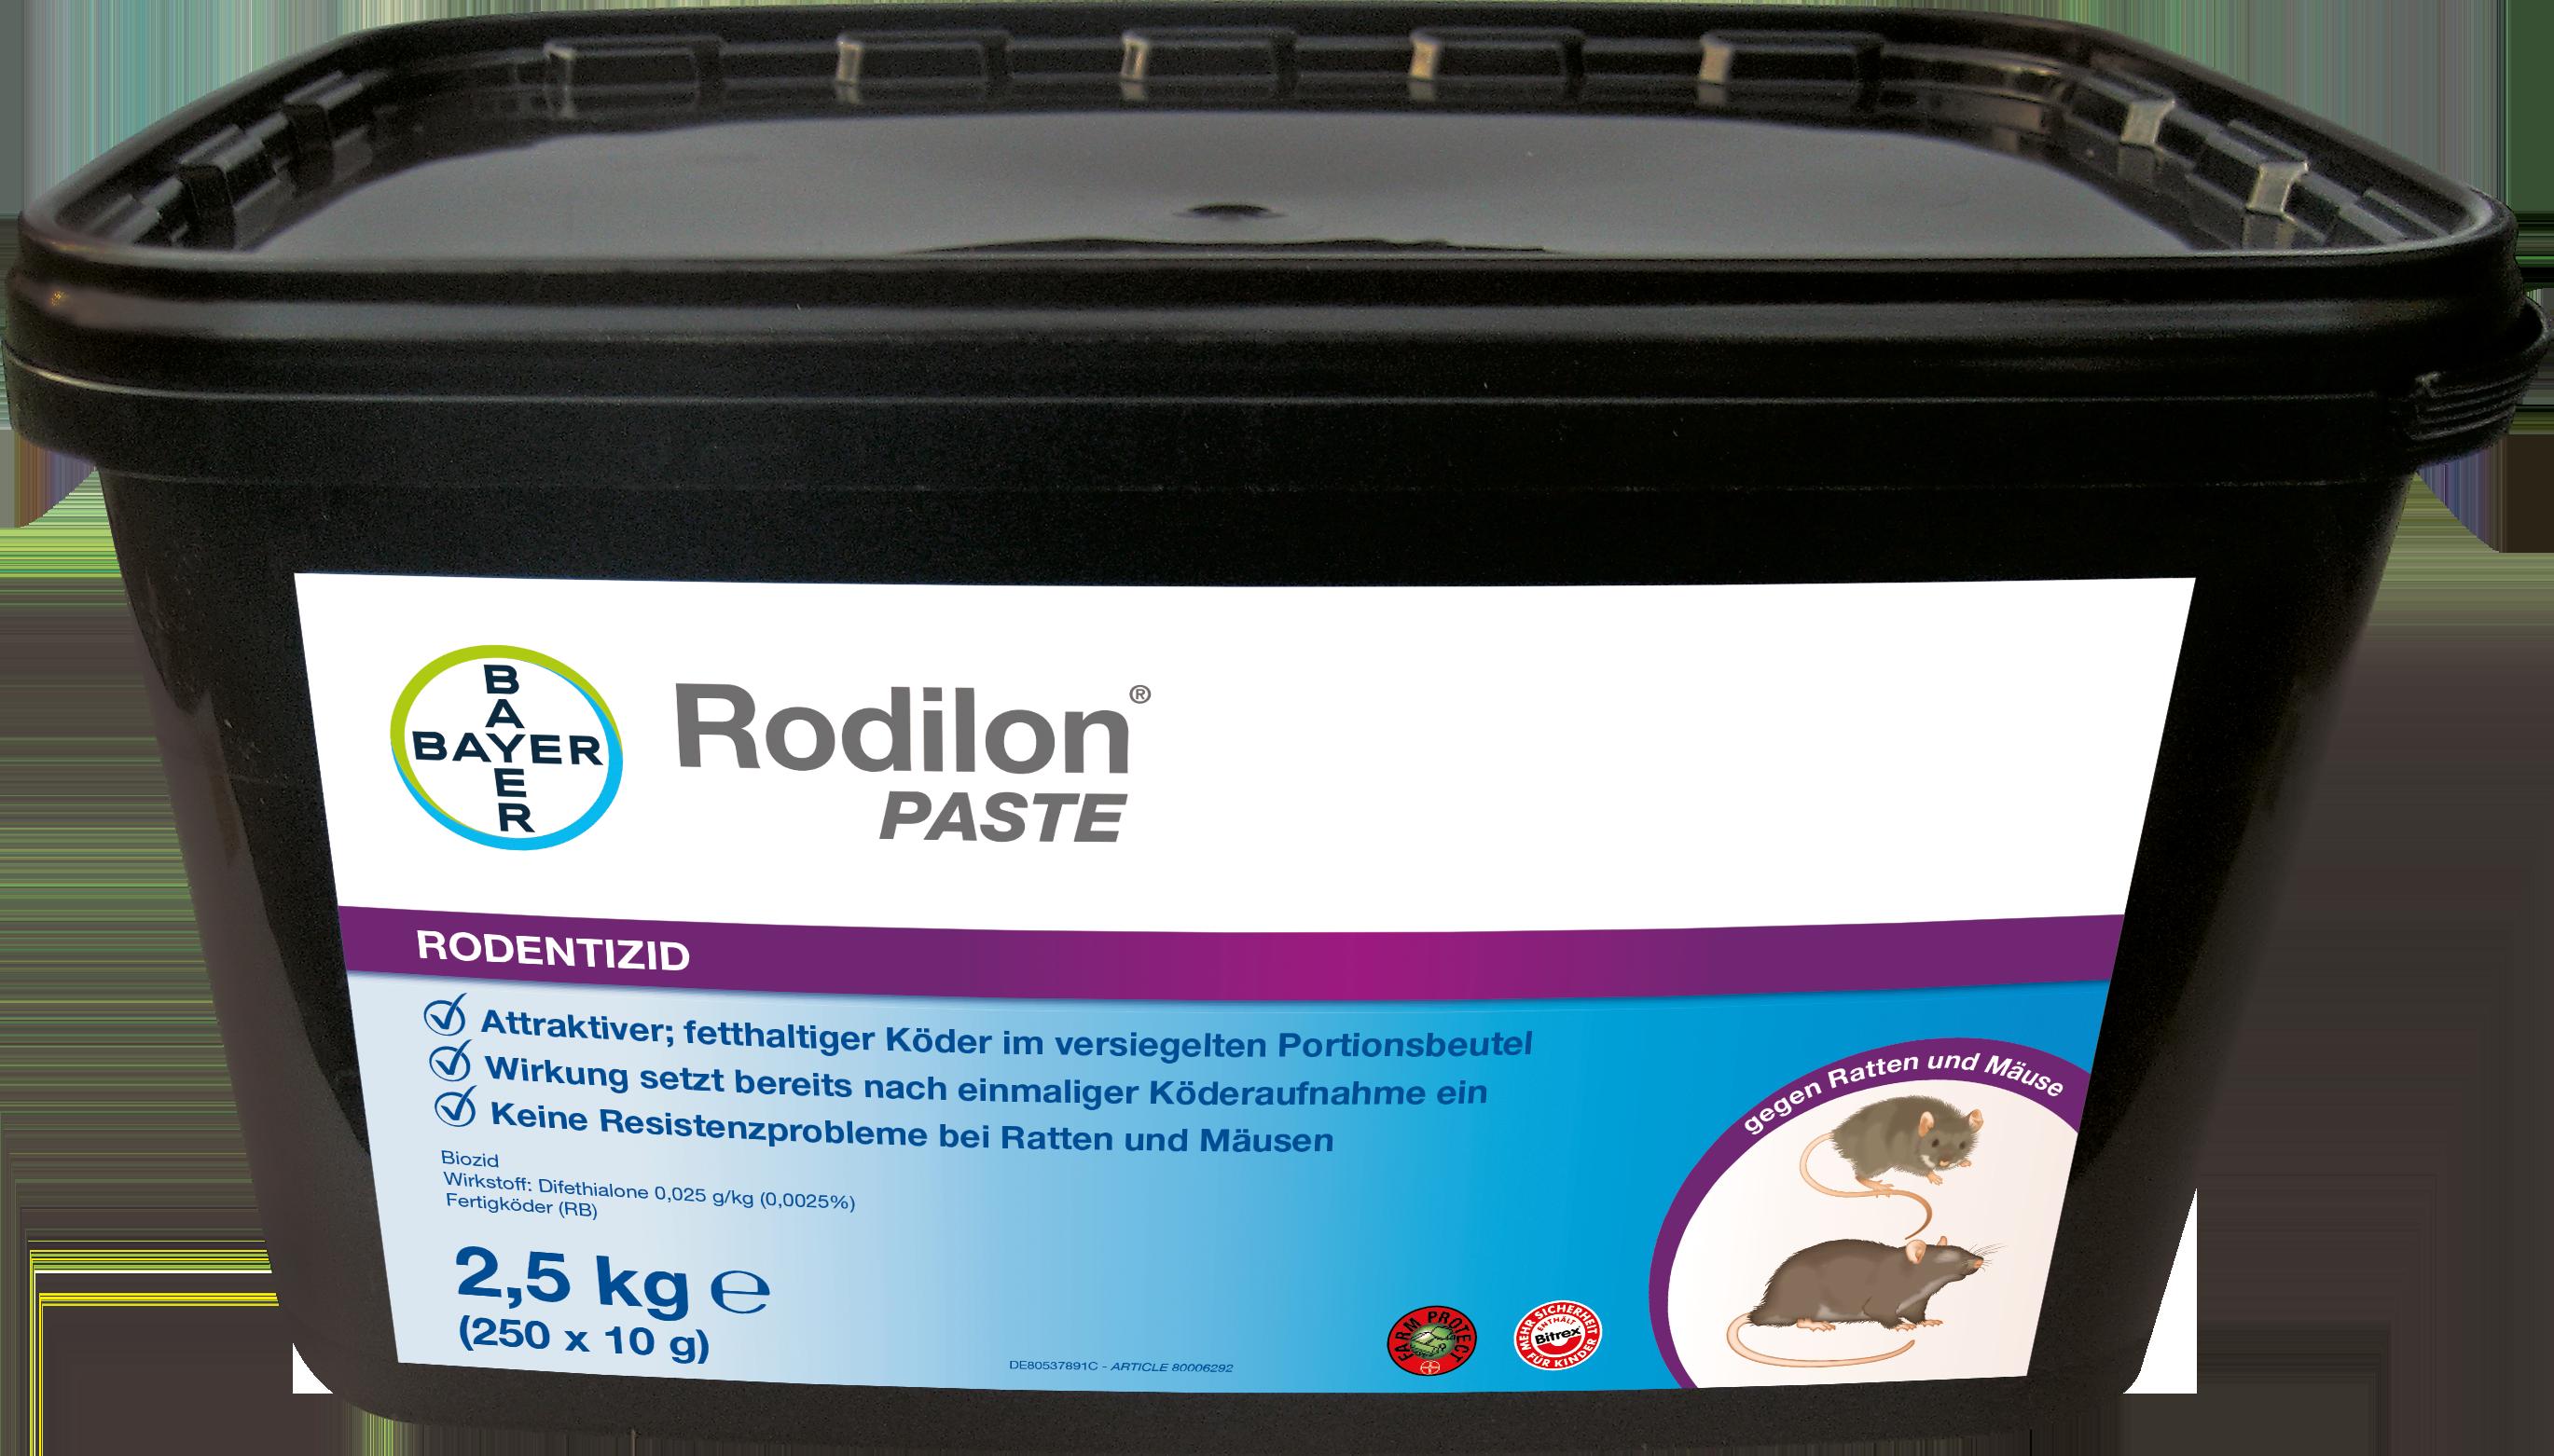 Rodilon® Paste